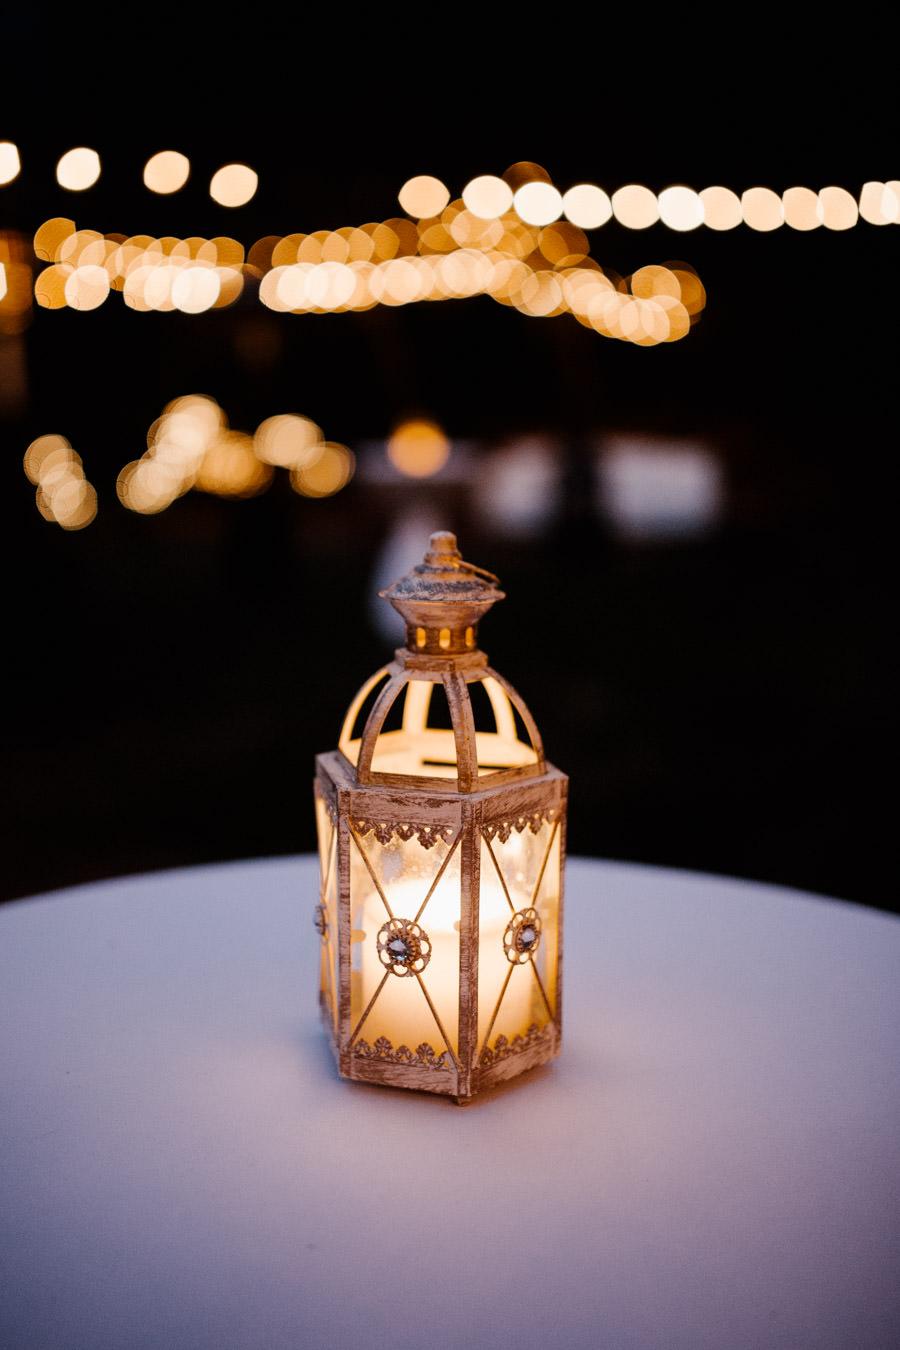 lantern detail with beautiful bokeh on the back